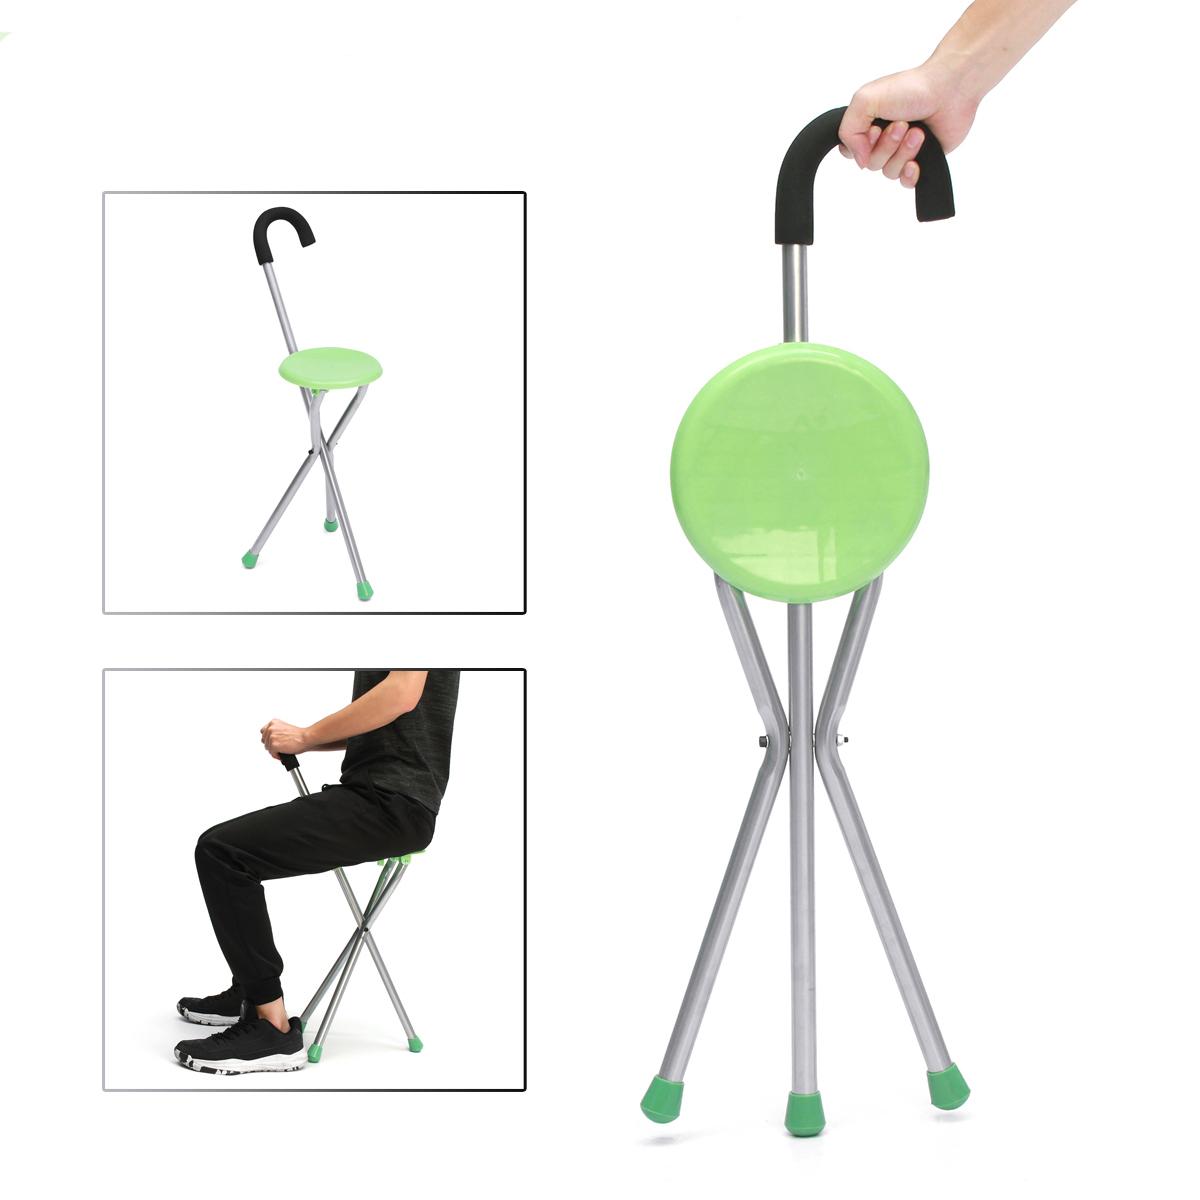 walking stick seat stool chair baby pink chairs camping folding tripod cane